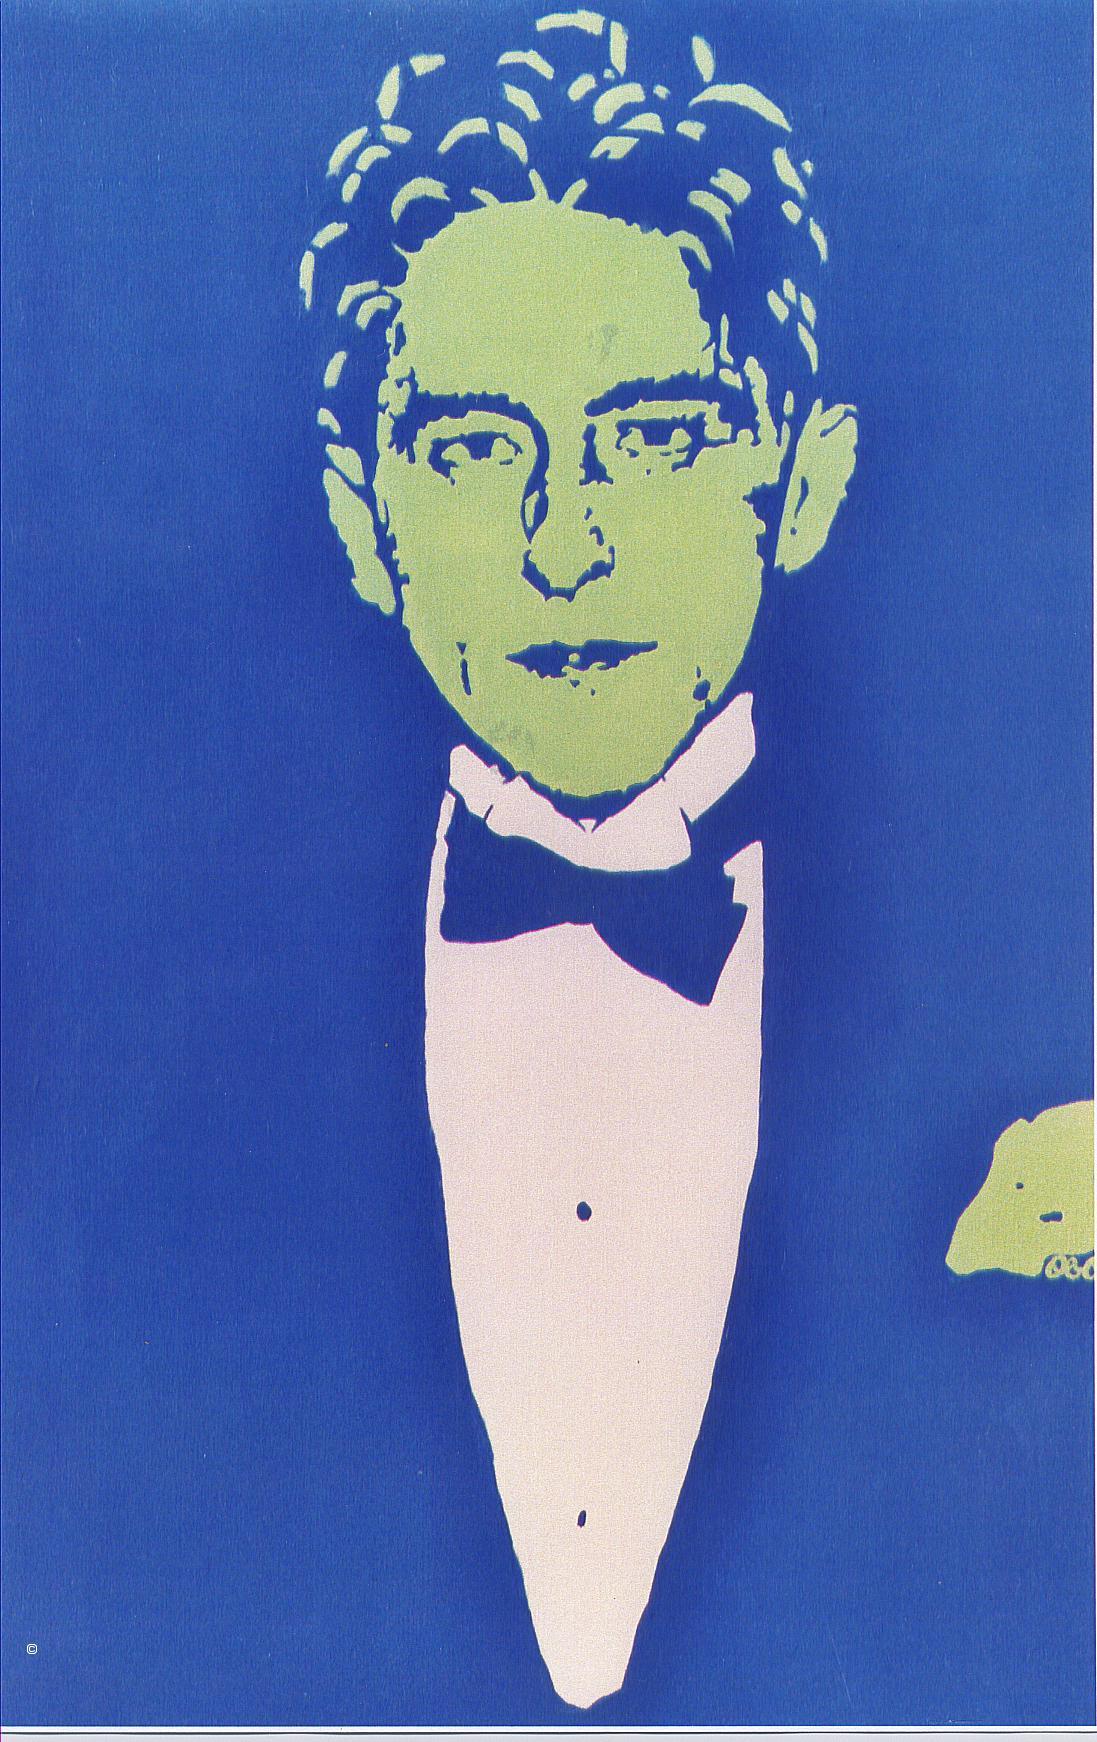 Jean Cocteau (Acrylique toile) - http://marina.oboe.free.fr